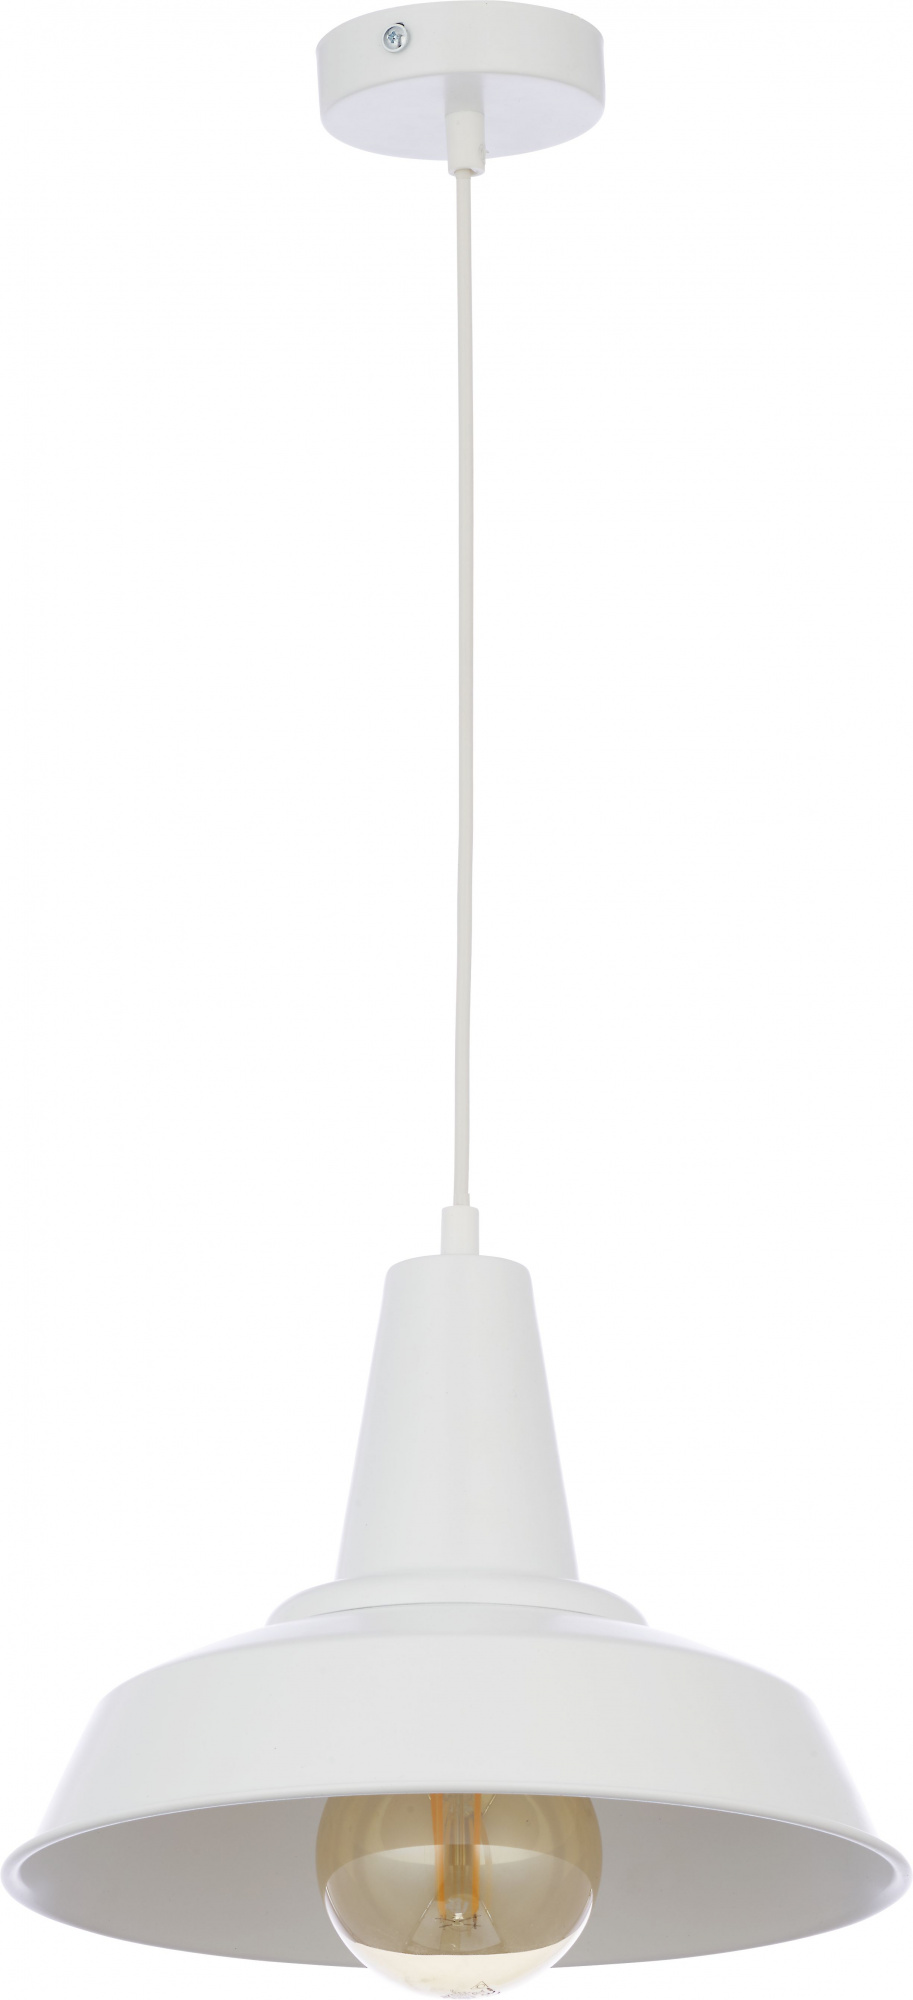 TK Lighting TK-2796 Bell függeszték